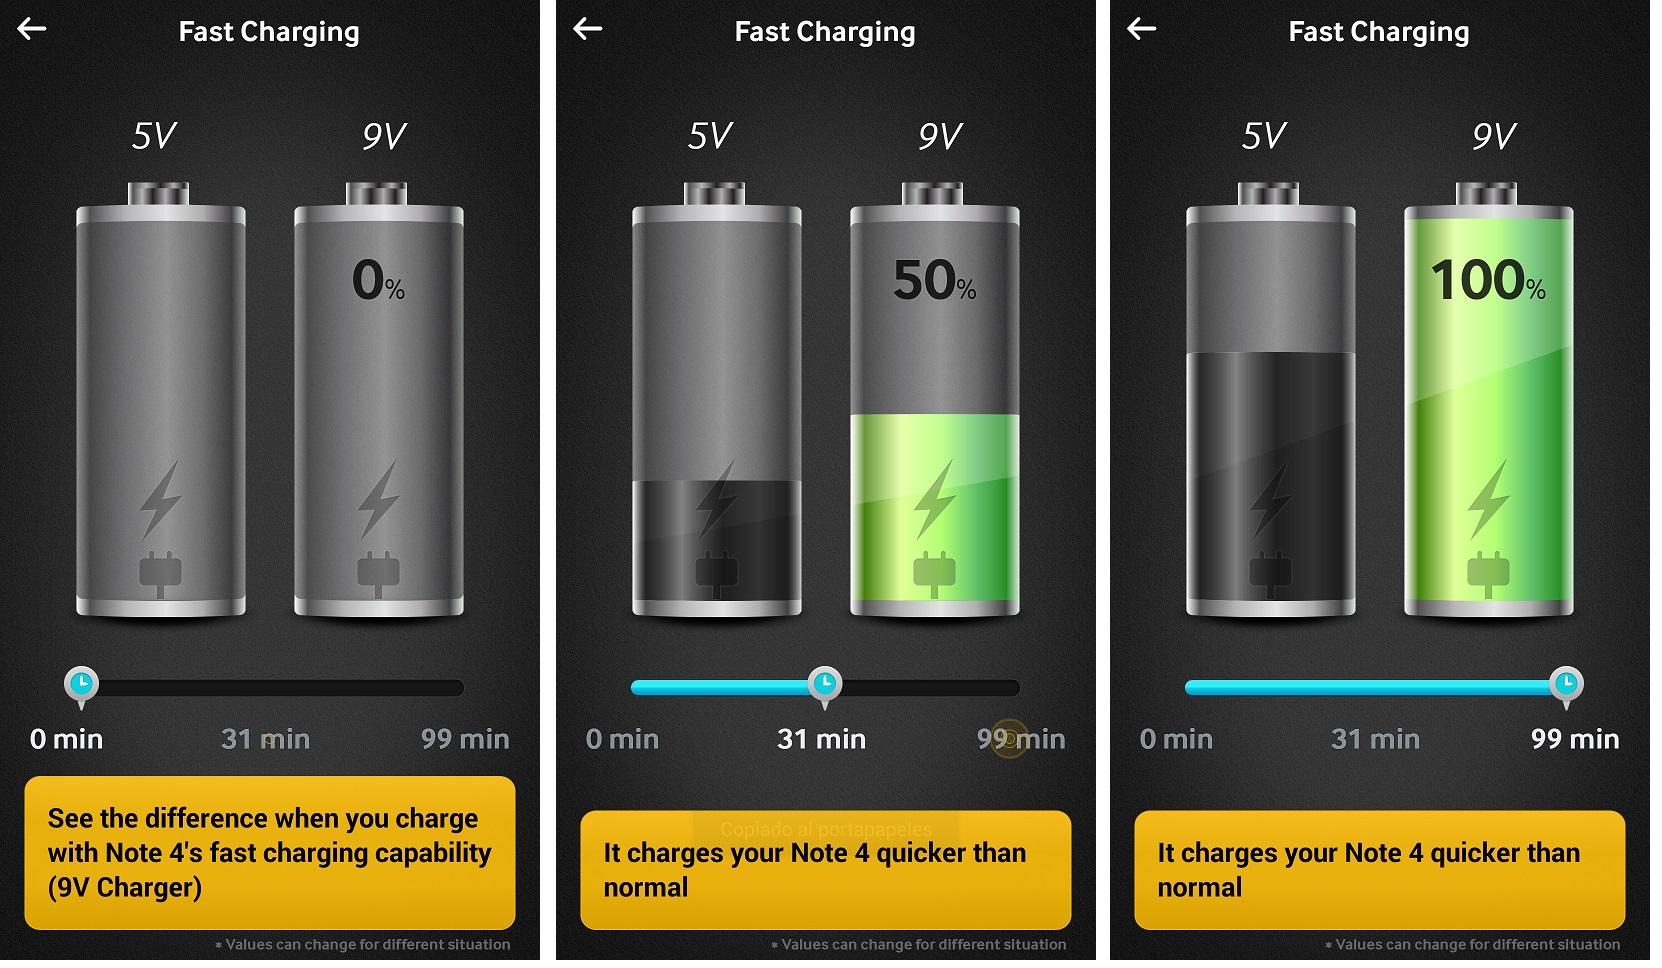 [Galaxy Note 4] 可以將快速充電變壓器給別的型號使用嗎? 或是使用別的型號變壓器使用於Galaxy Note 4?